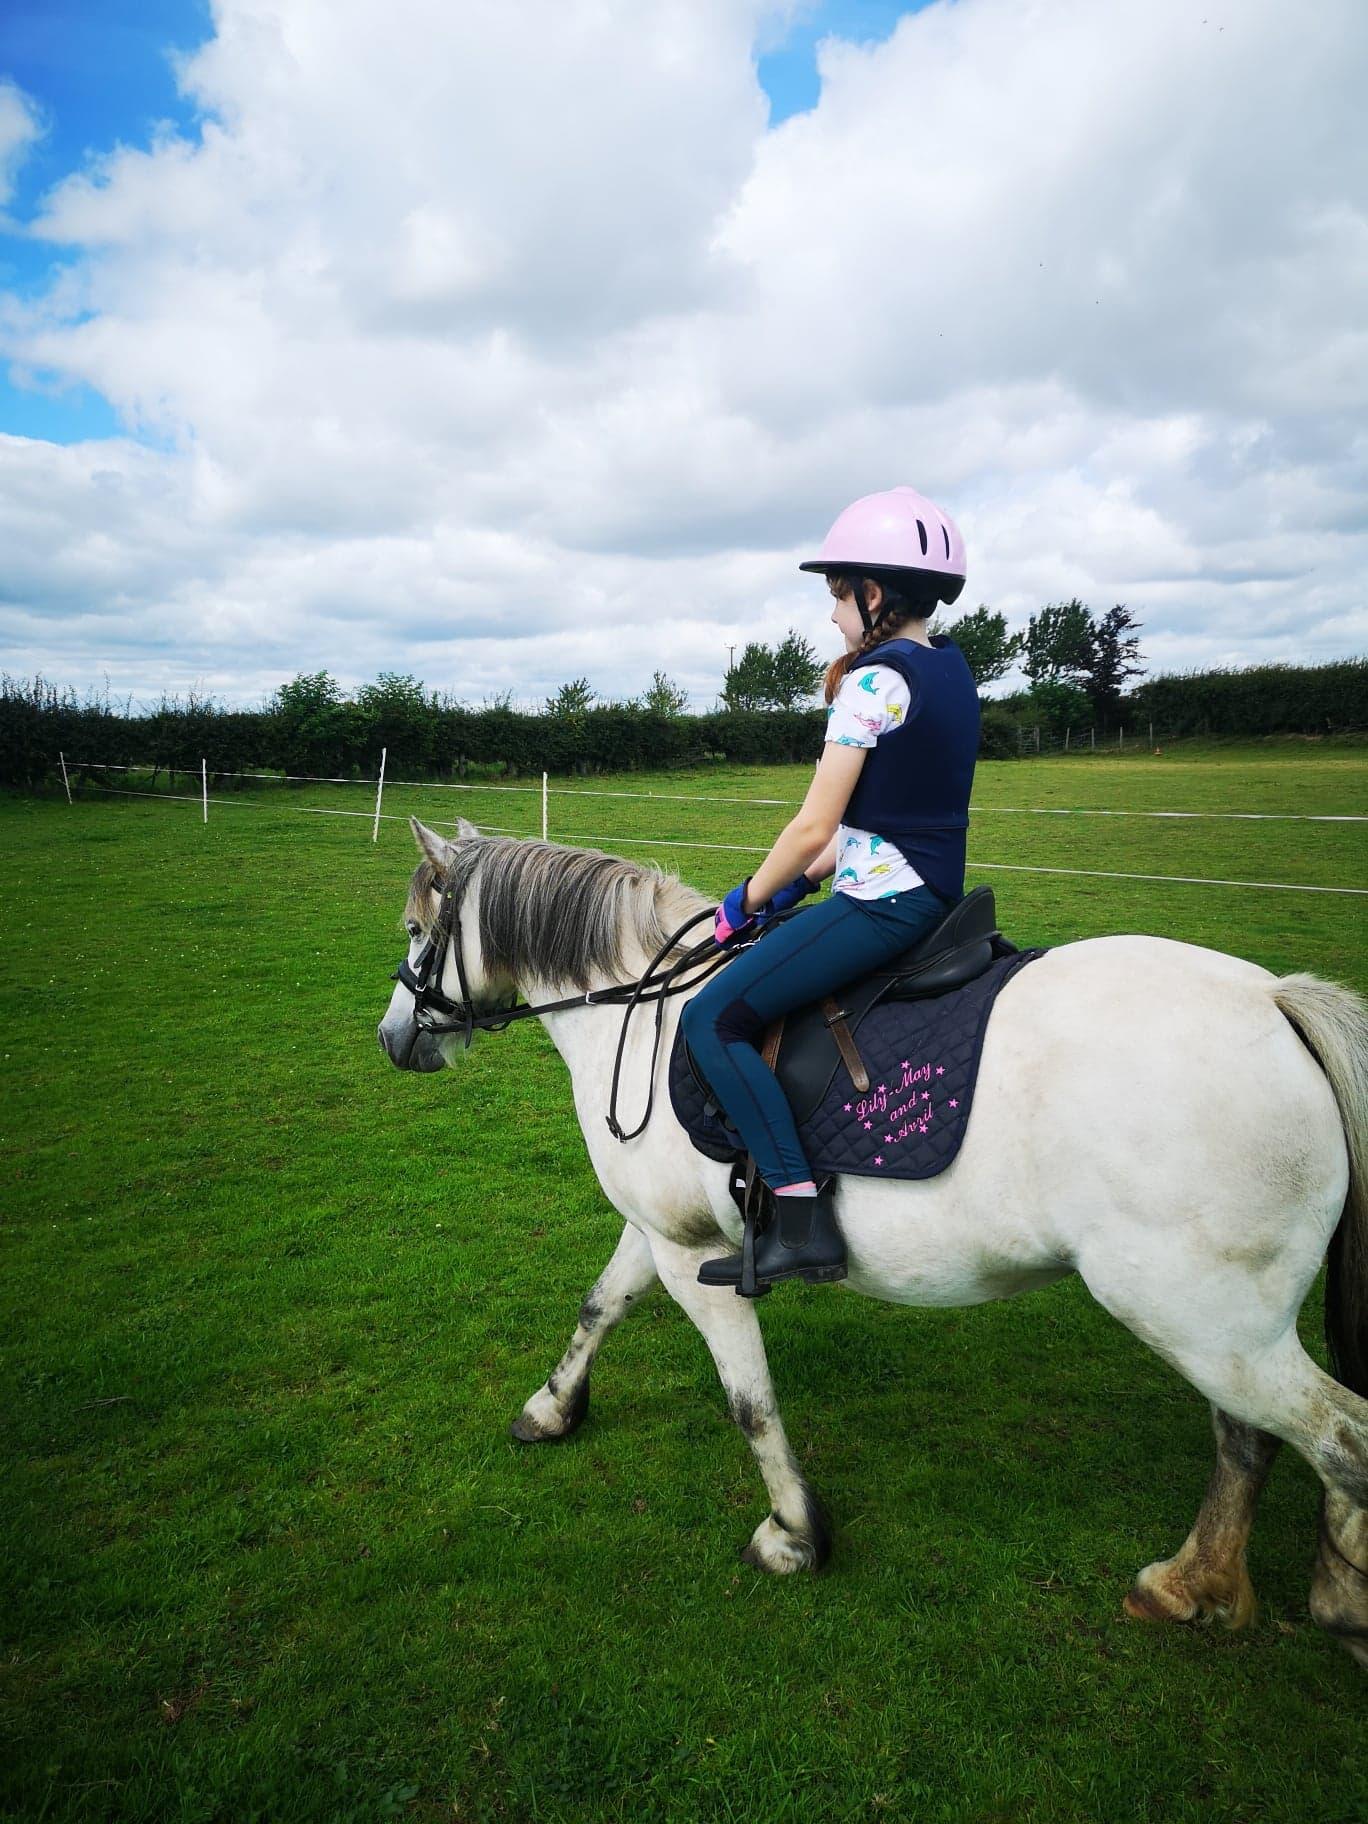 Girl riding a white pony